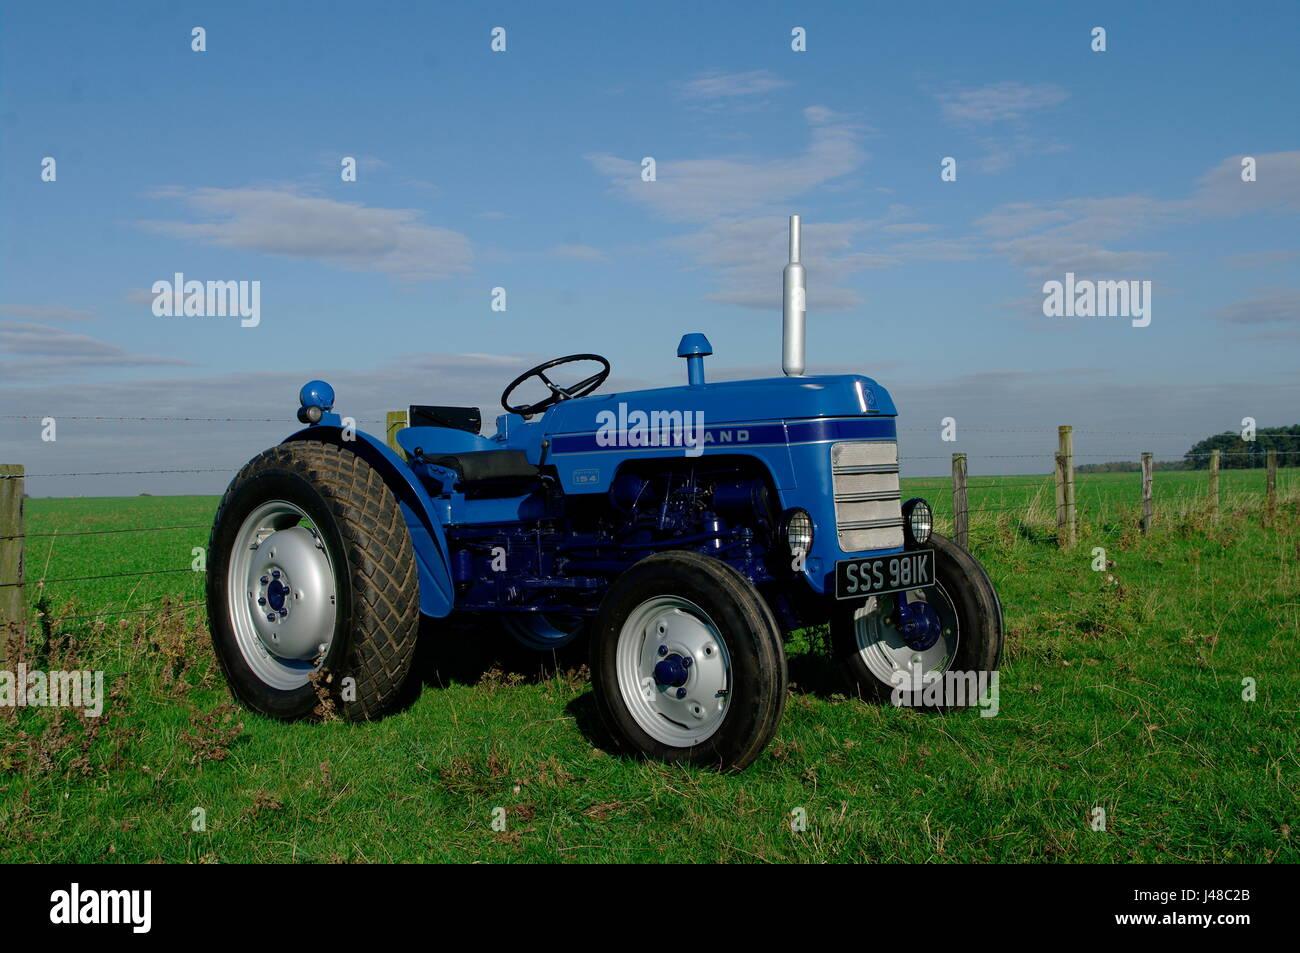 Leyland 154 Vintage Tractor Stock Photo  Royalty Free